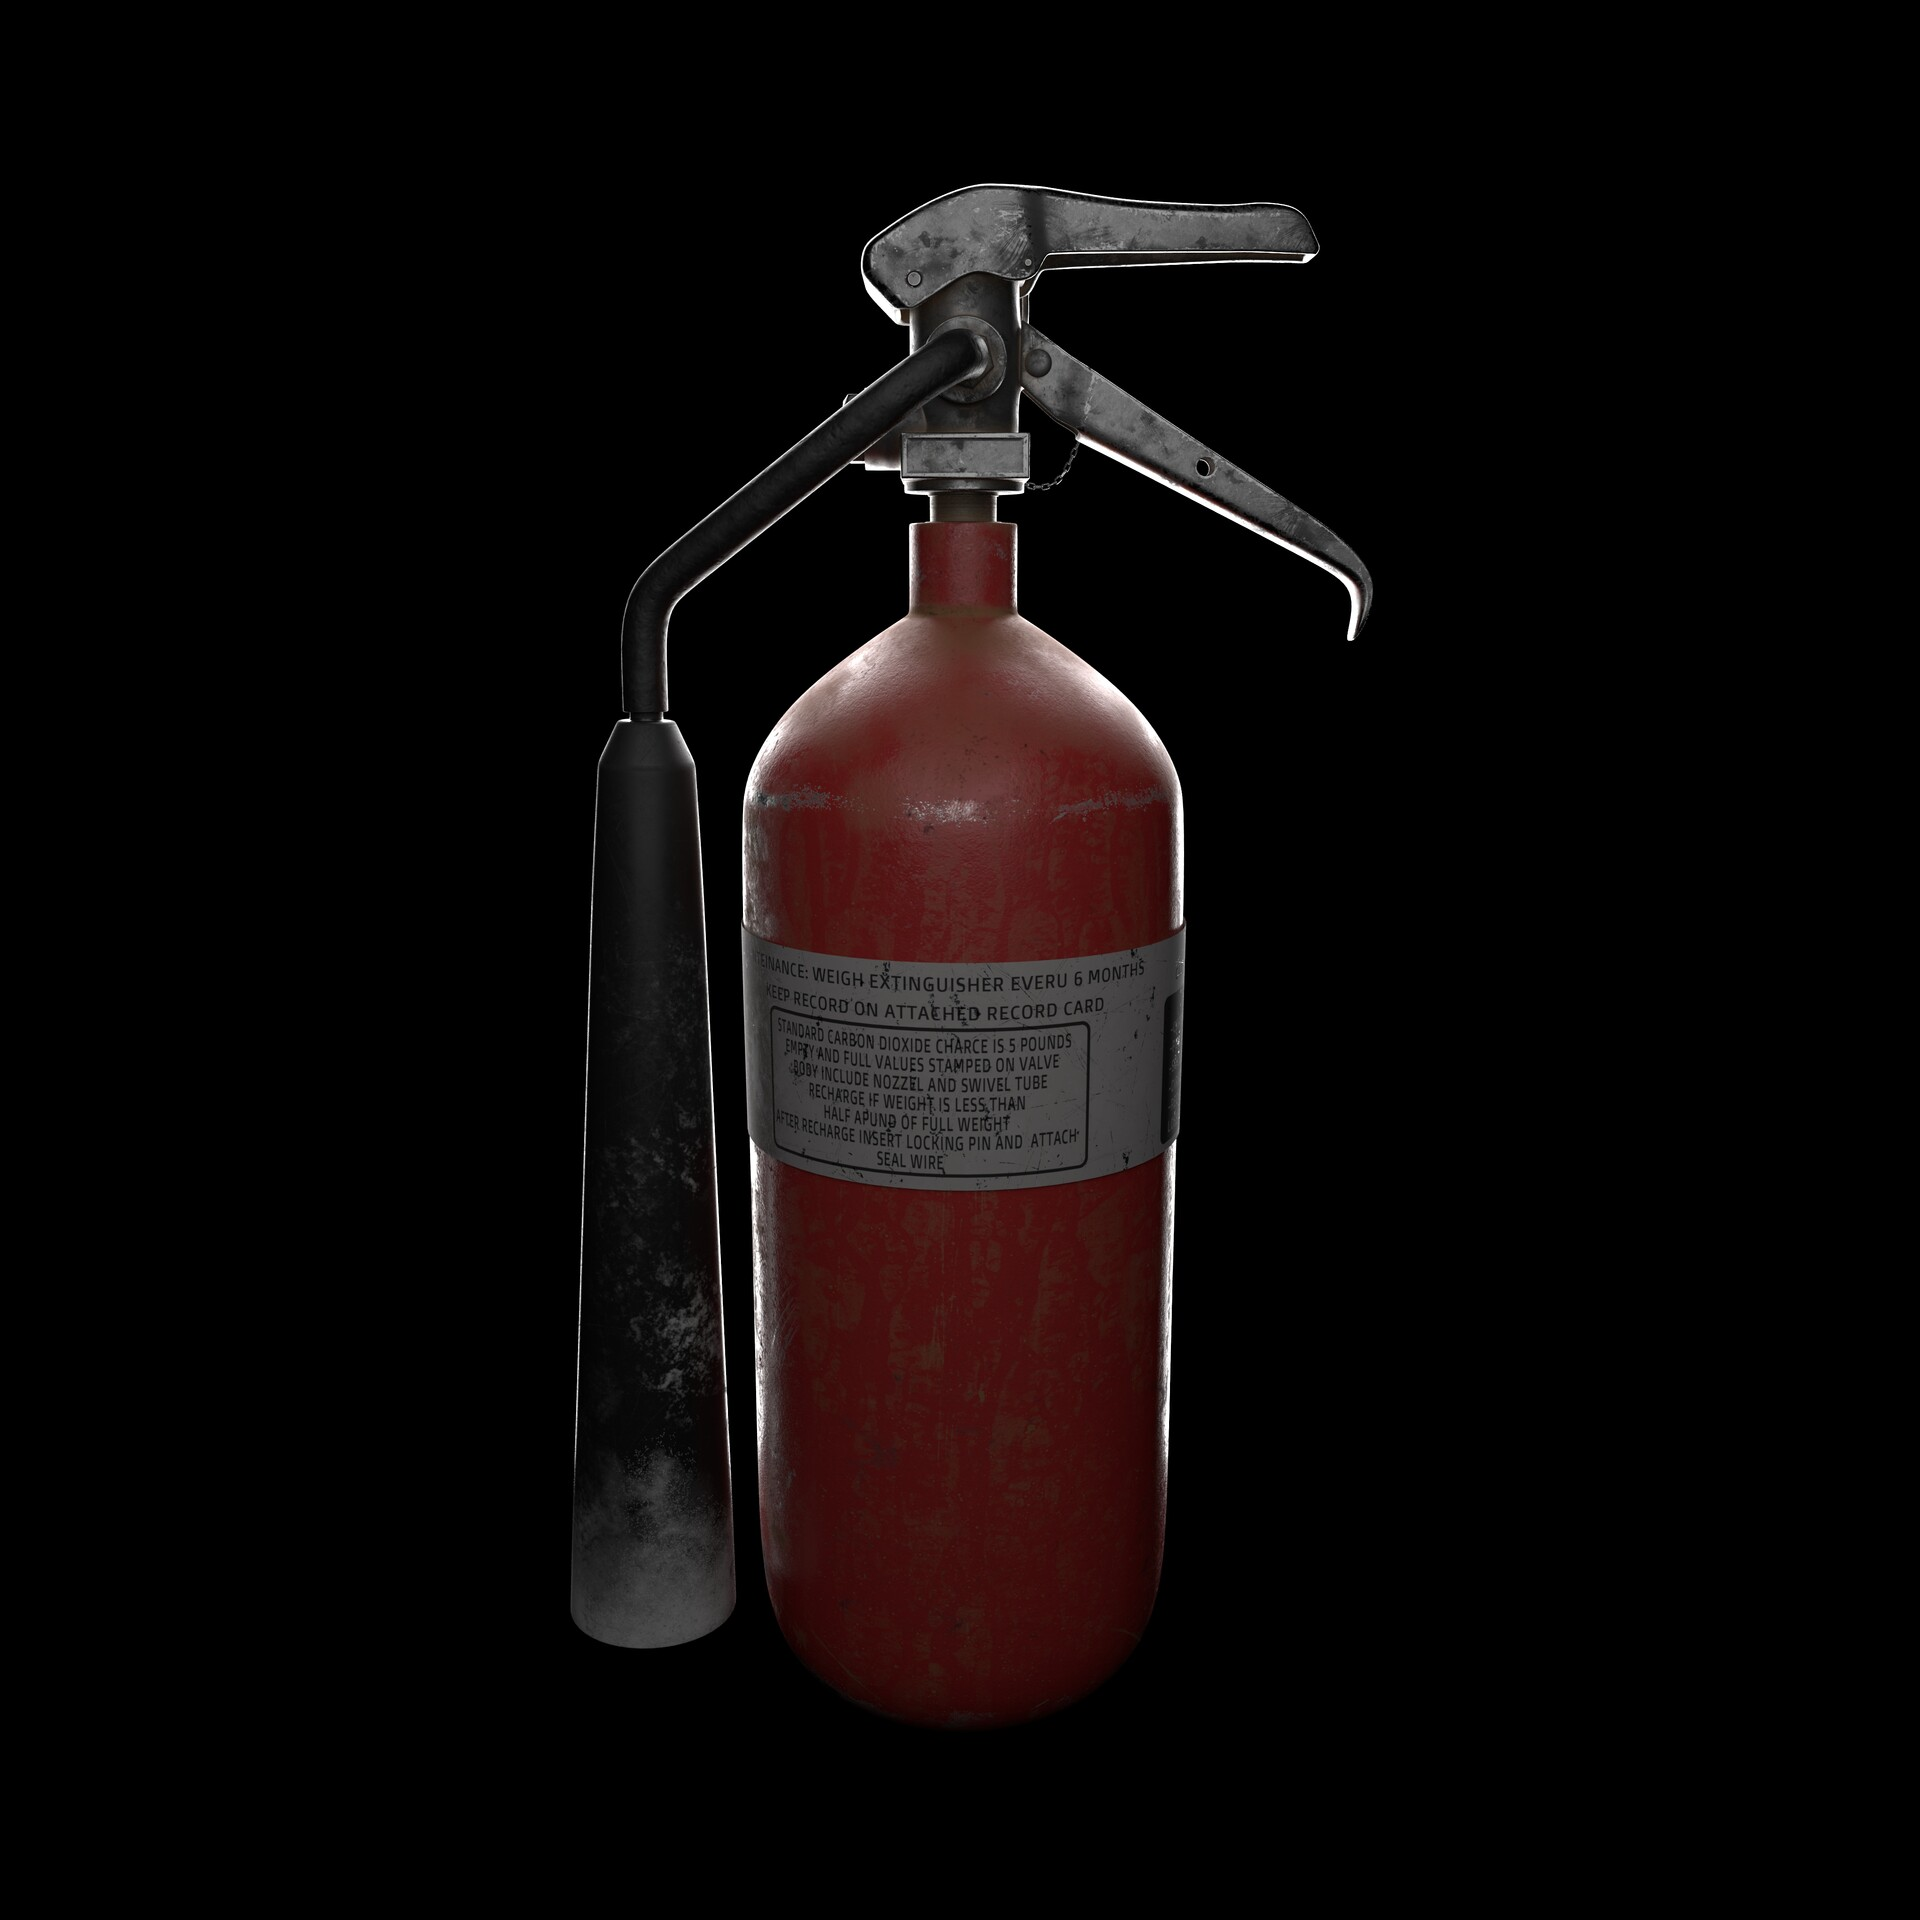 Darko mitev fireextinguisher01